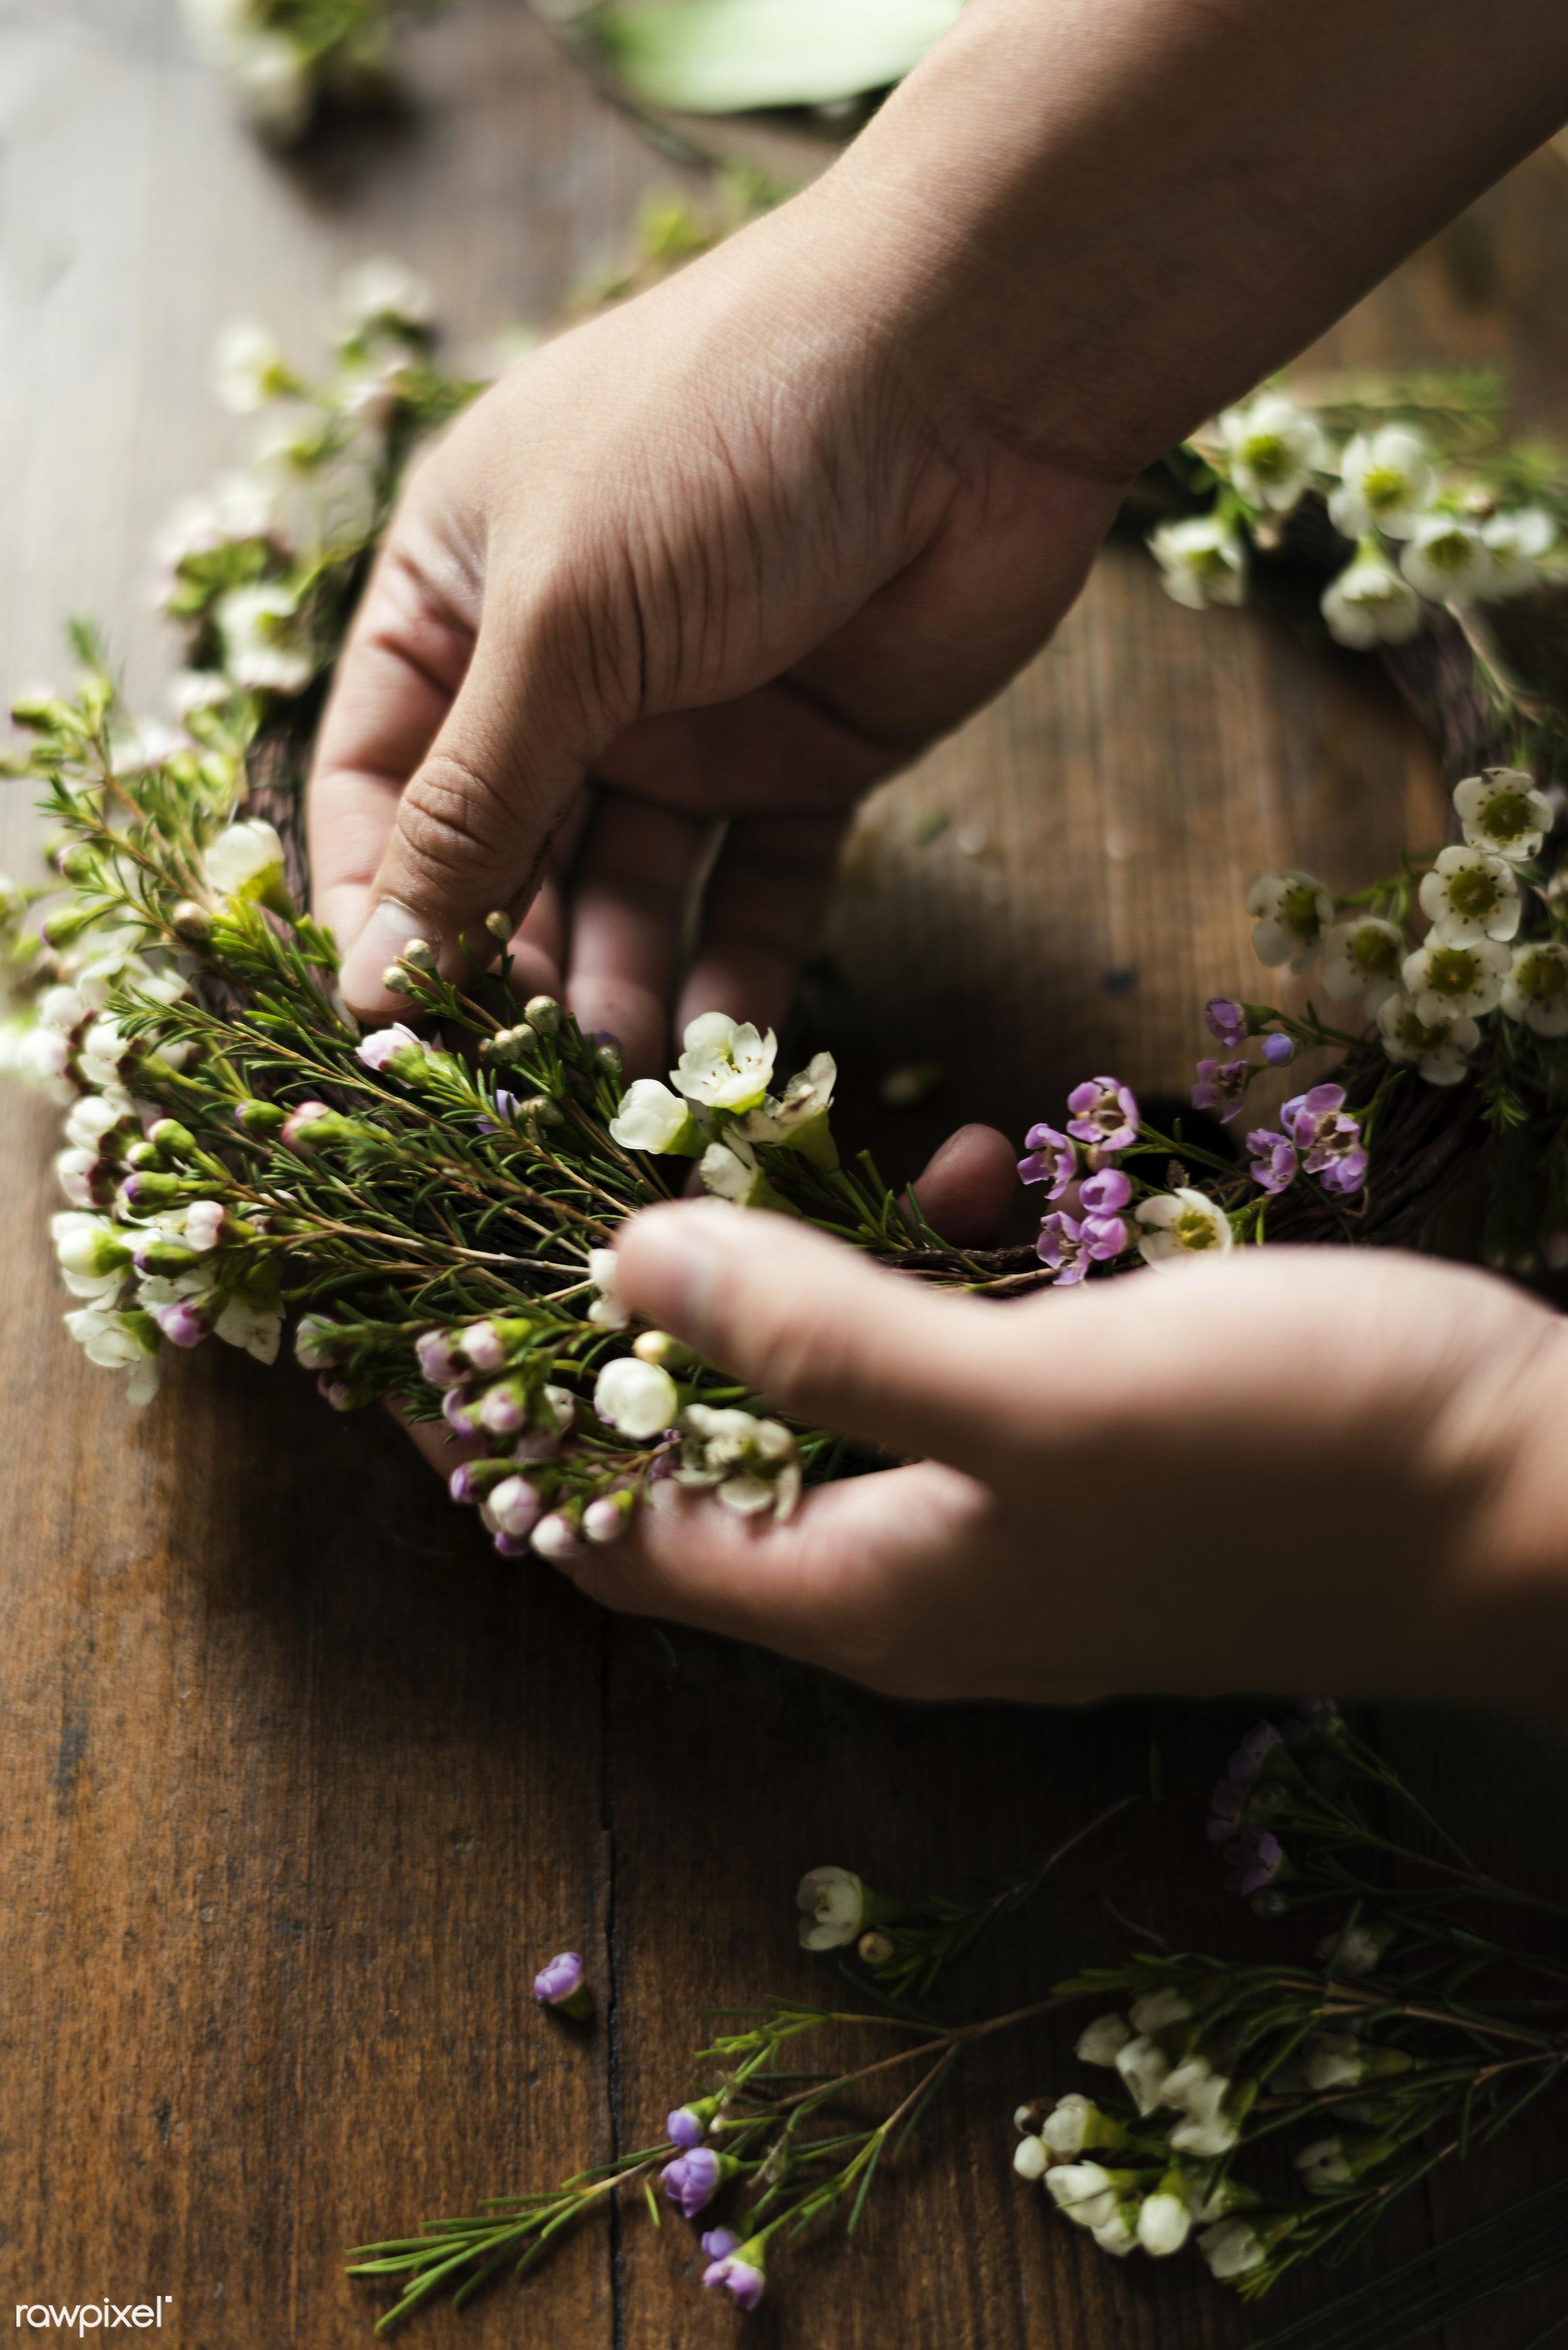 shop, detail, person, merchandise, people, decor, nature, flowers, work, refreshment, hold, career, florist, present,...